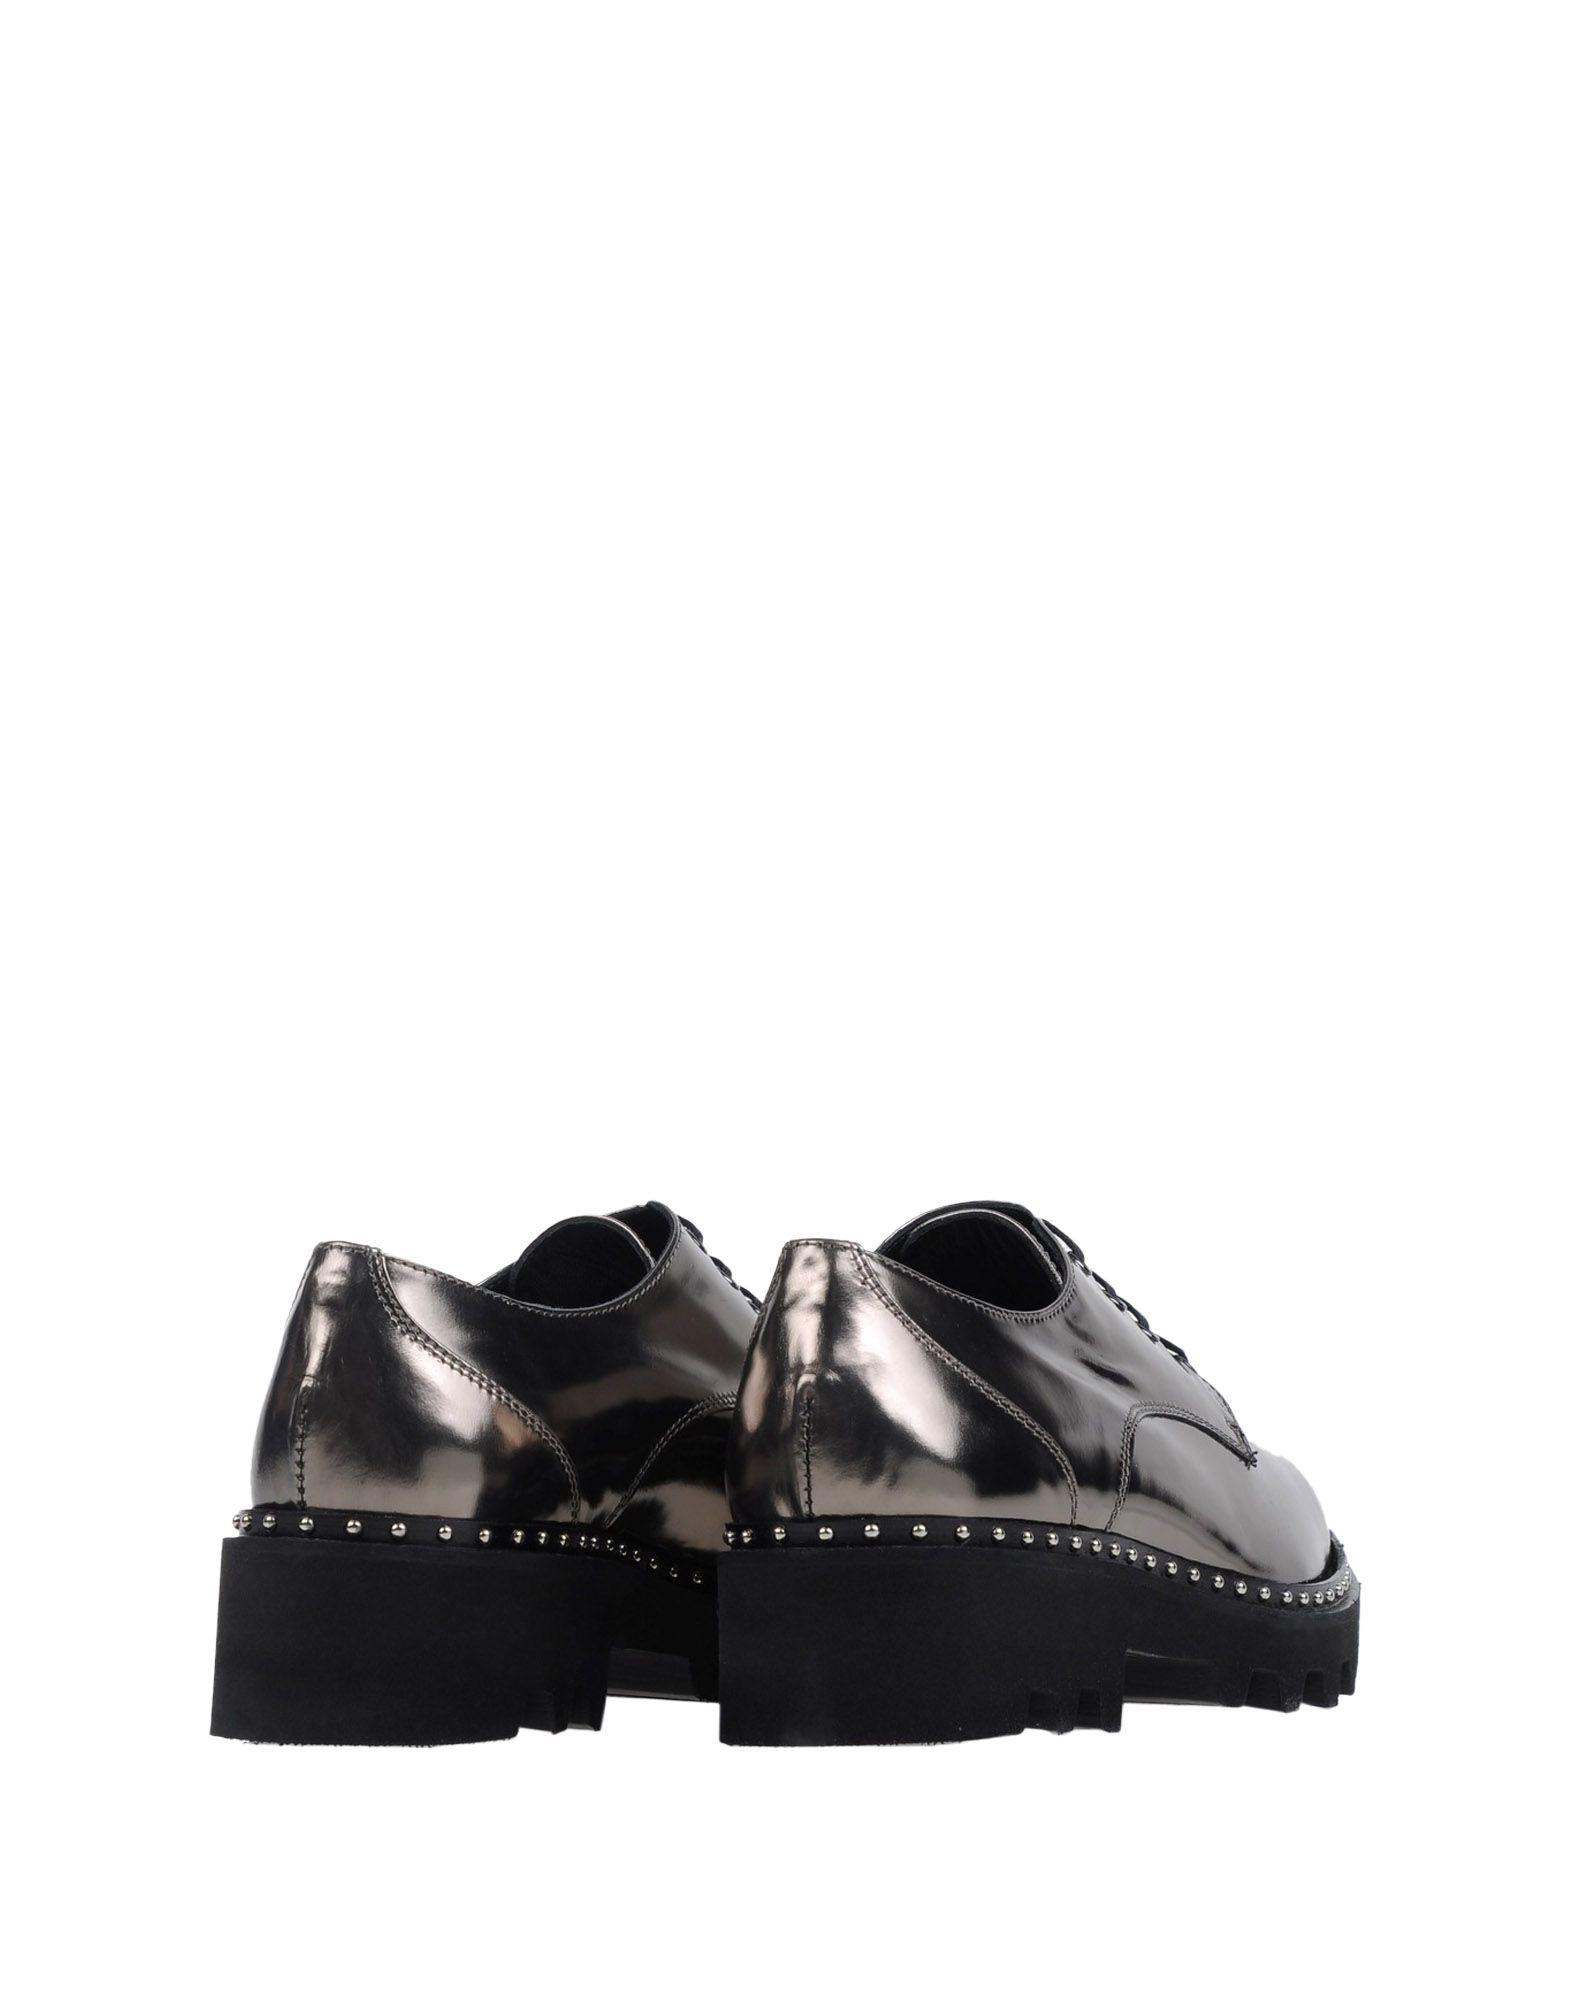 8 Schnürschuhe Damen  11090545KH Gute Qualität beliebte Schuhe